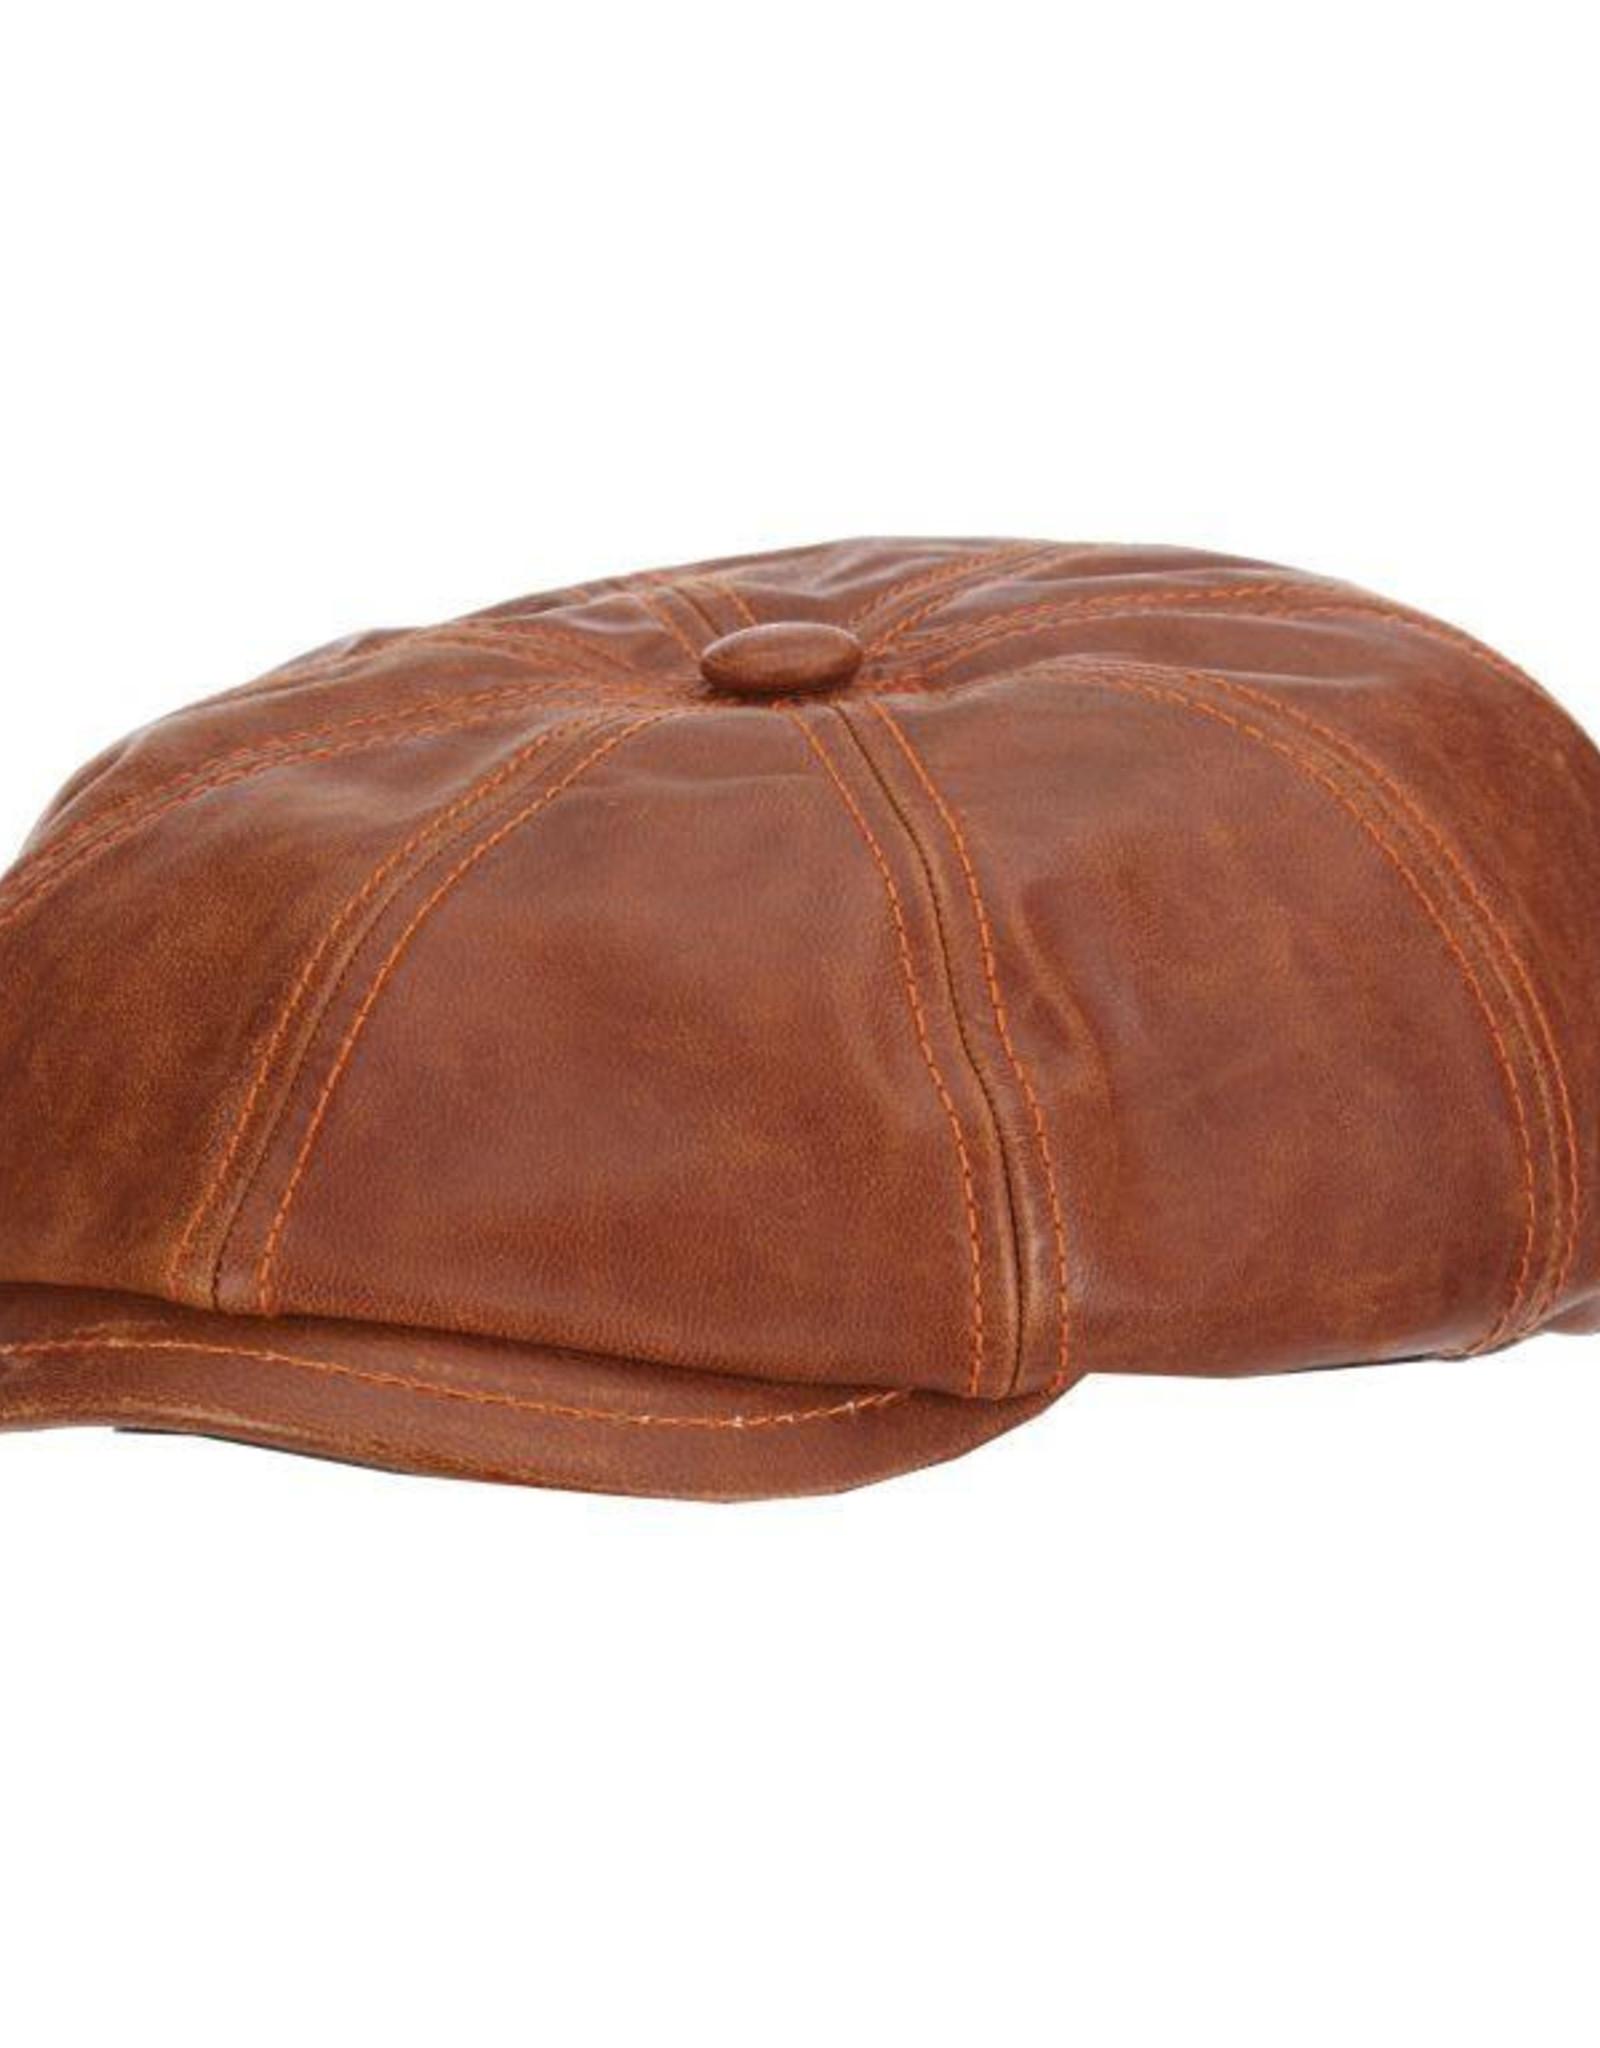 Hat Stetson  HARPER Goat Leather Saddle